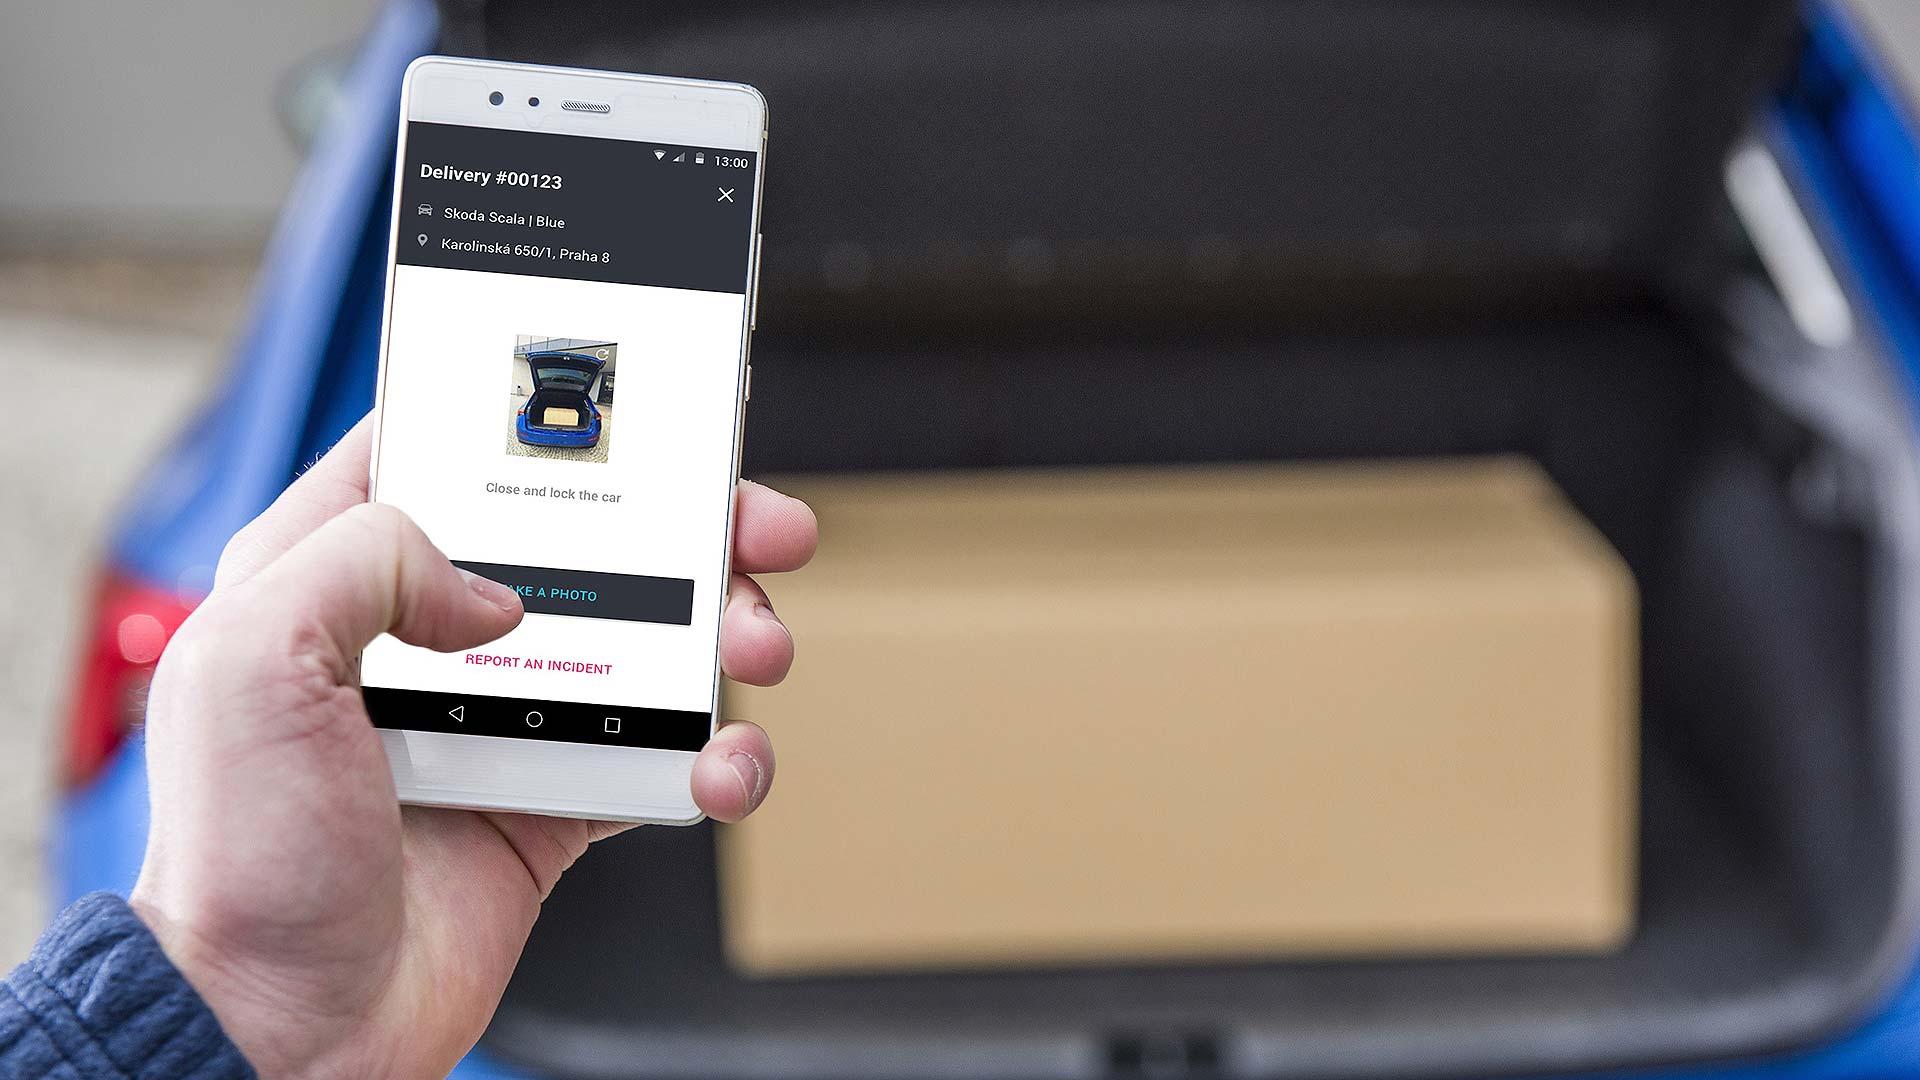 Skoda delivery app